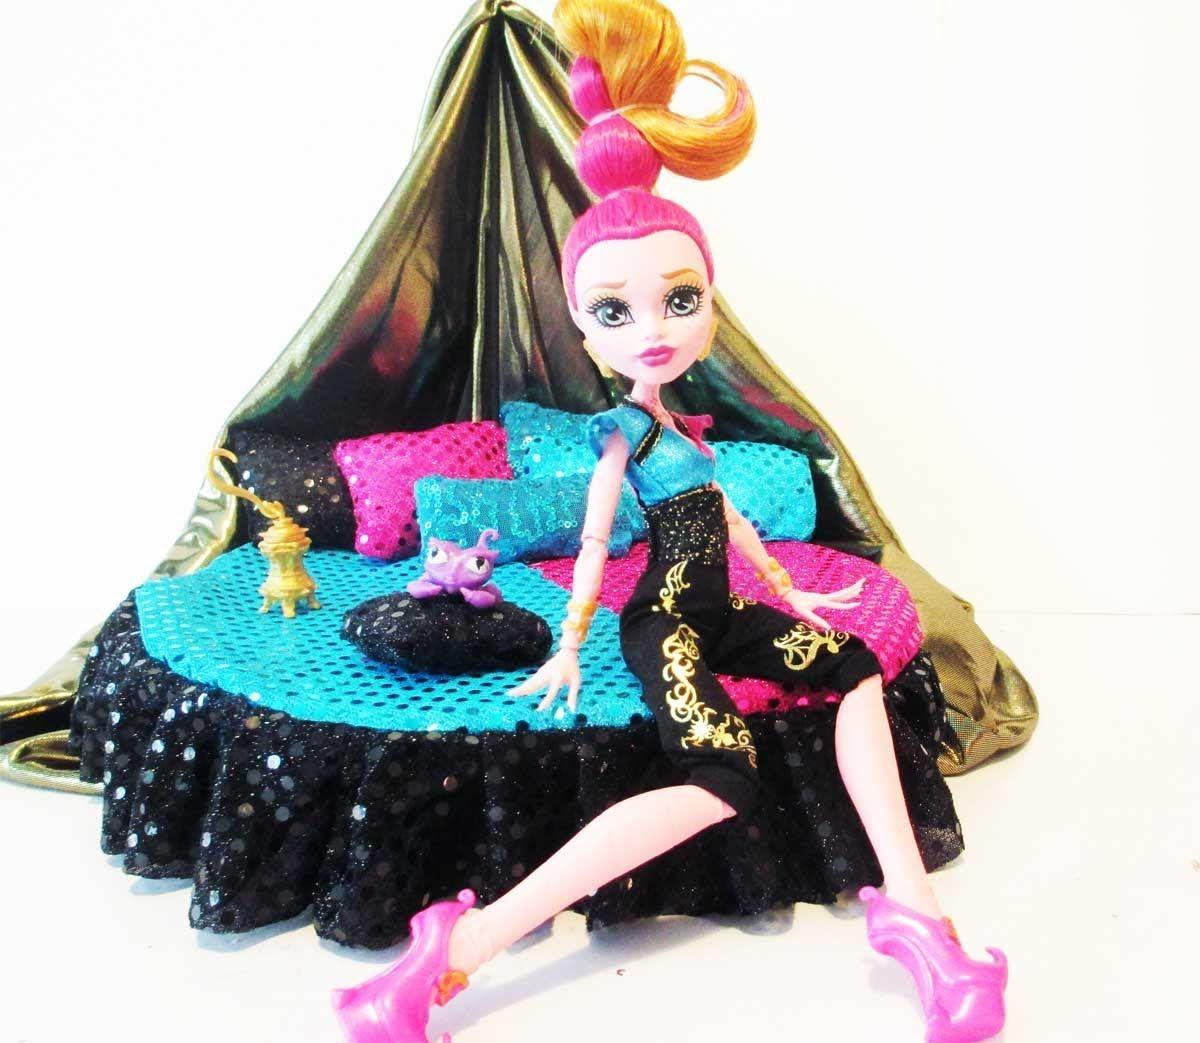 High Beds On Pinterest Monster High House Monster High Dollhouse Updated 2016 - Info Lowongan Kerja